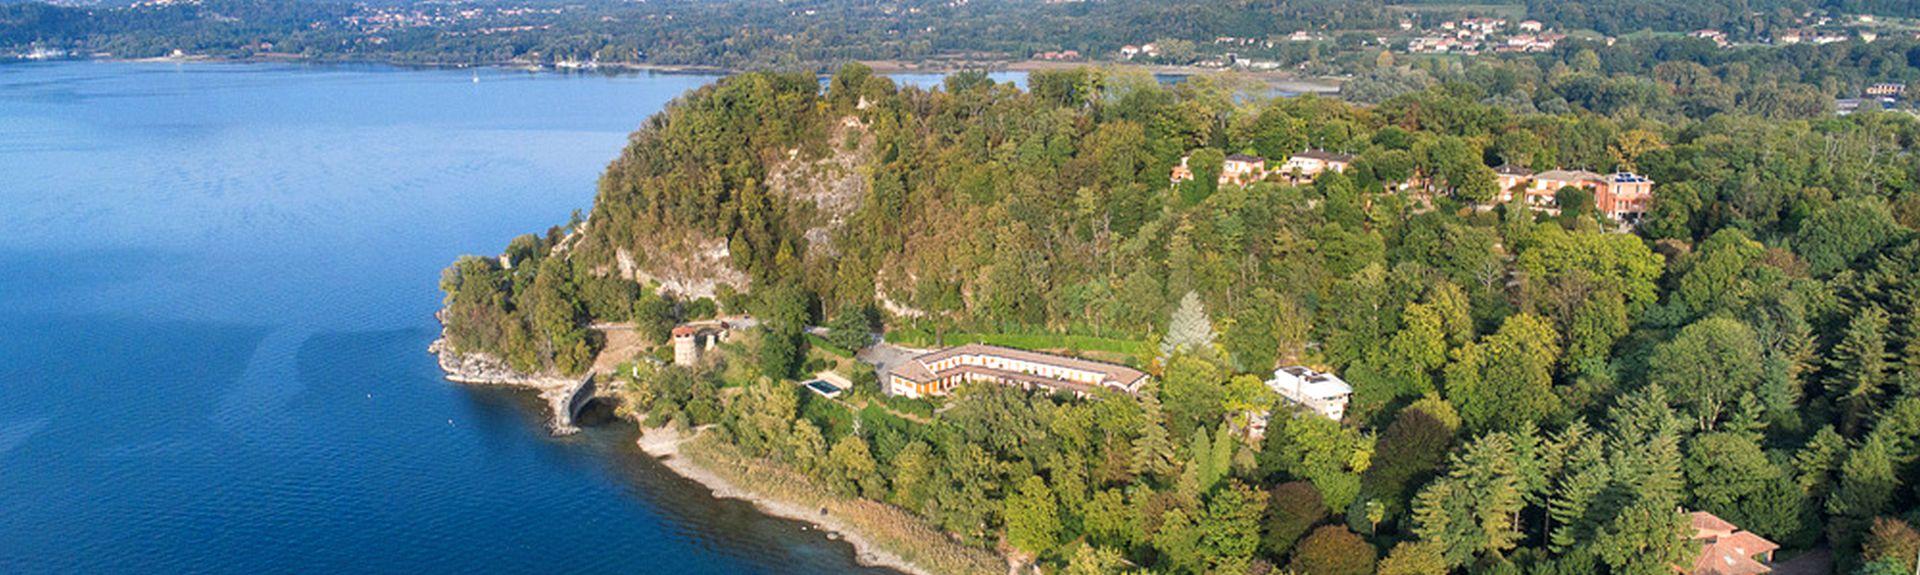 Alpino, Verbano-Cusio-Ossola, Piedmont, Italy